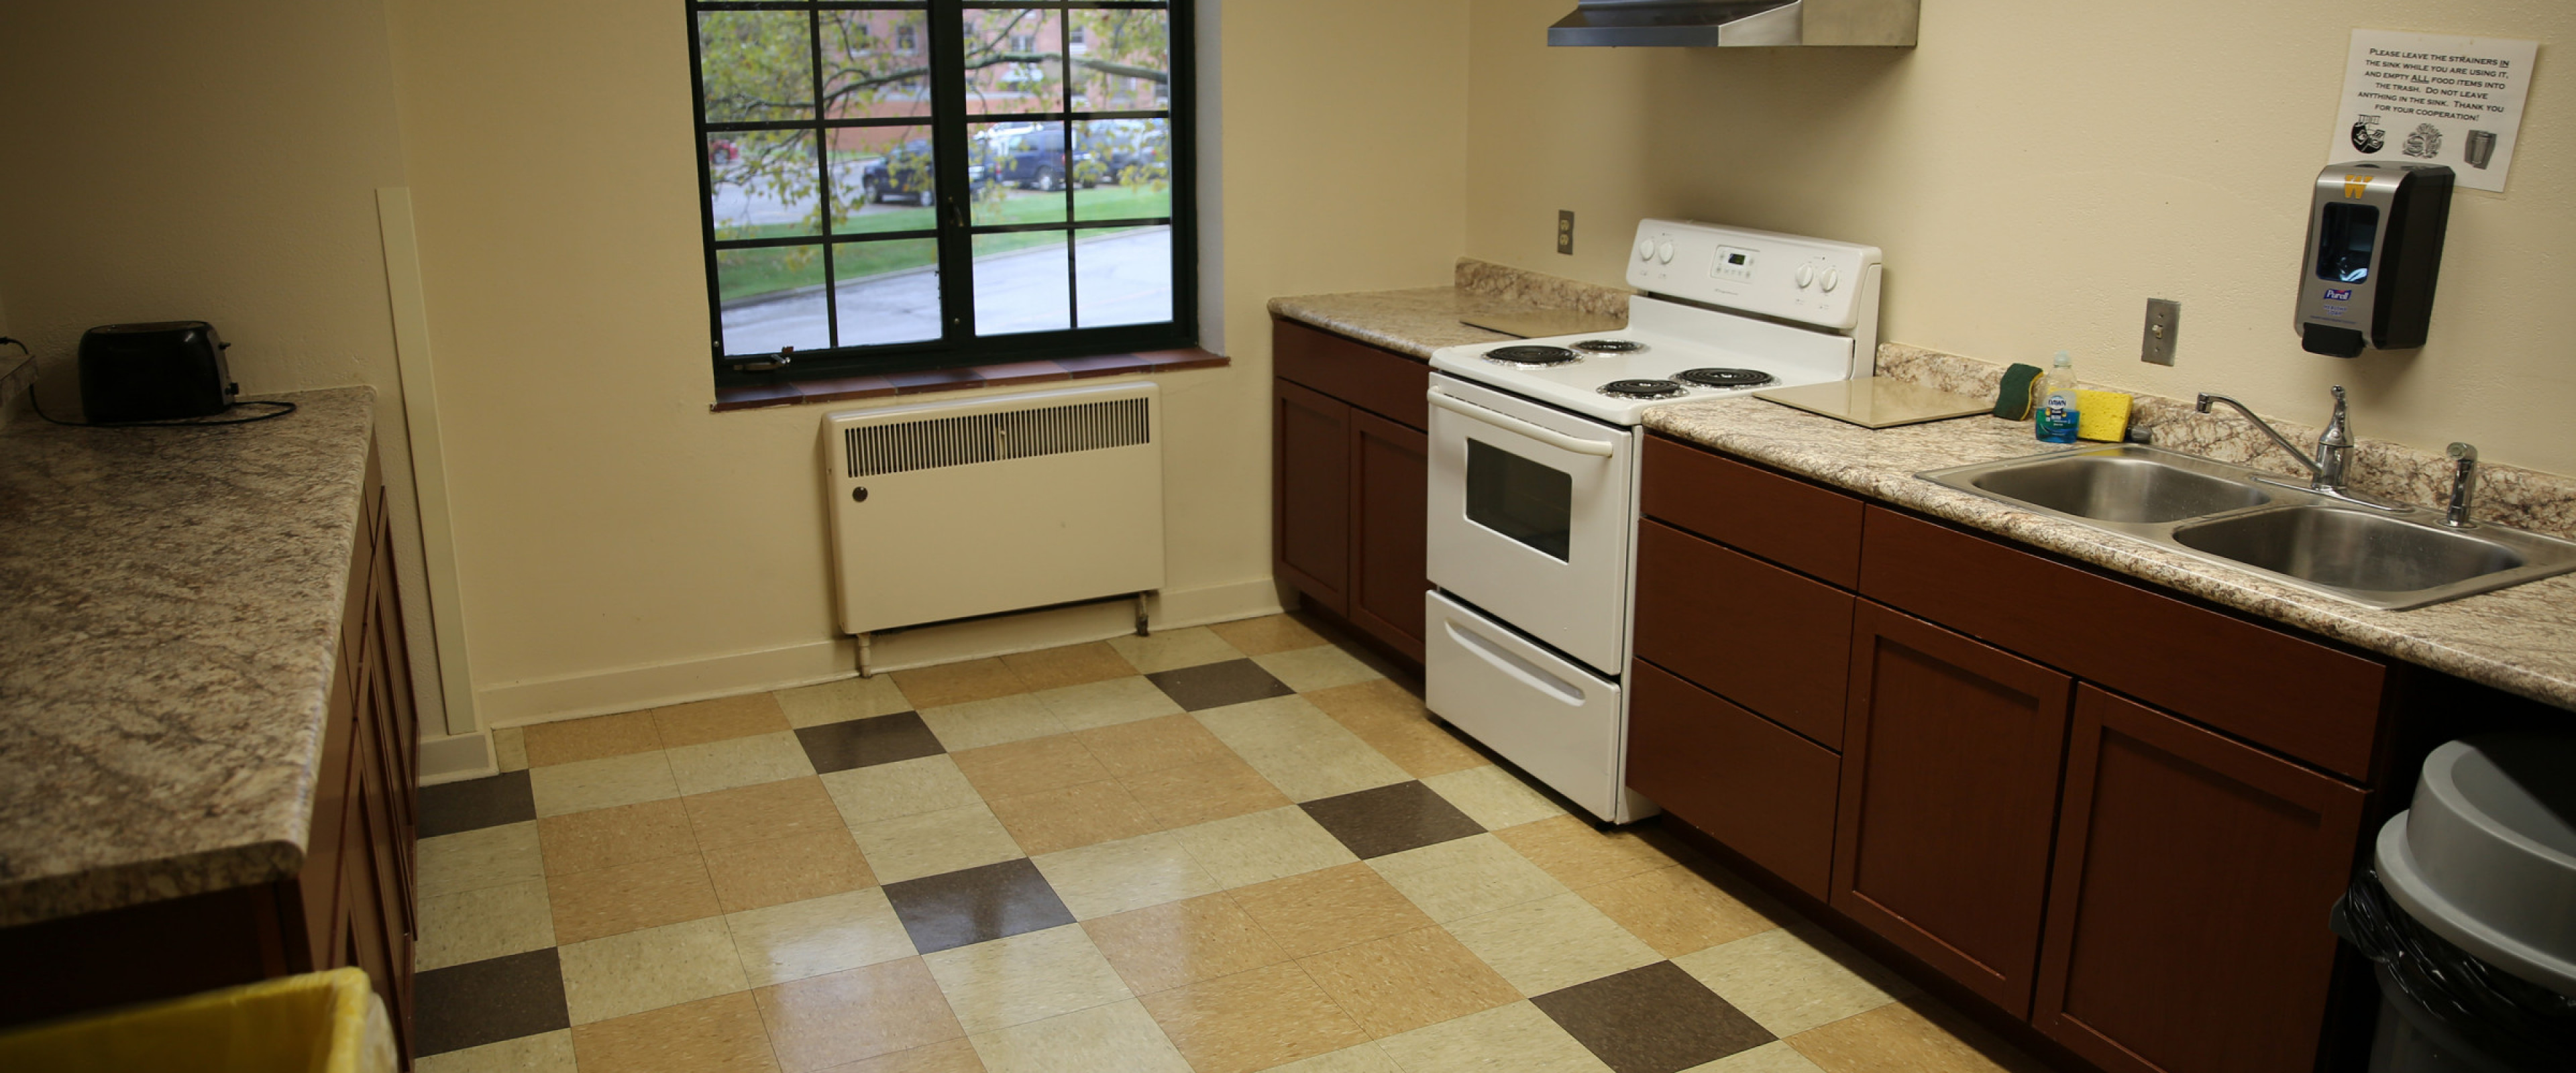 Spindler community kitchen